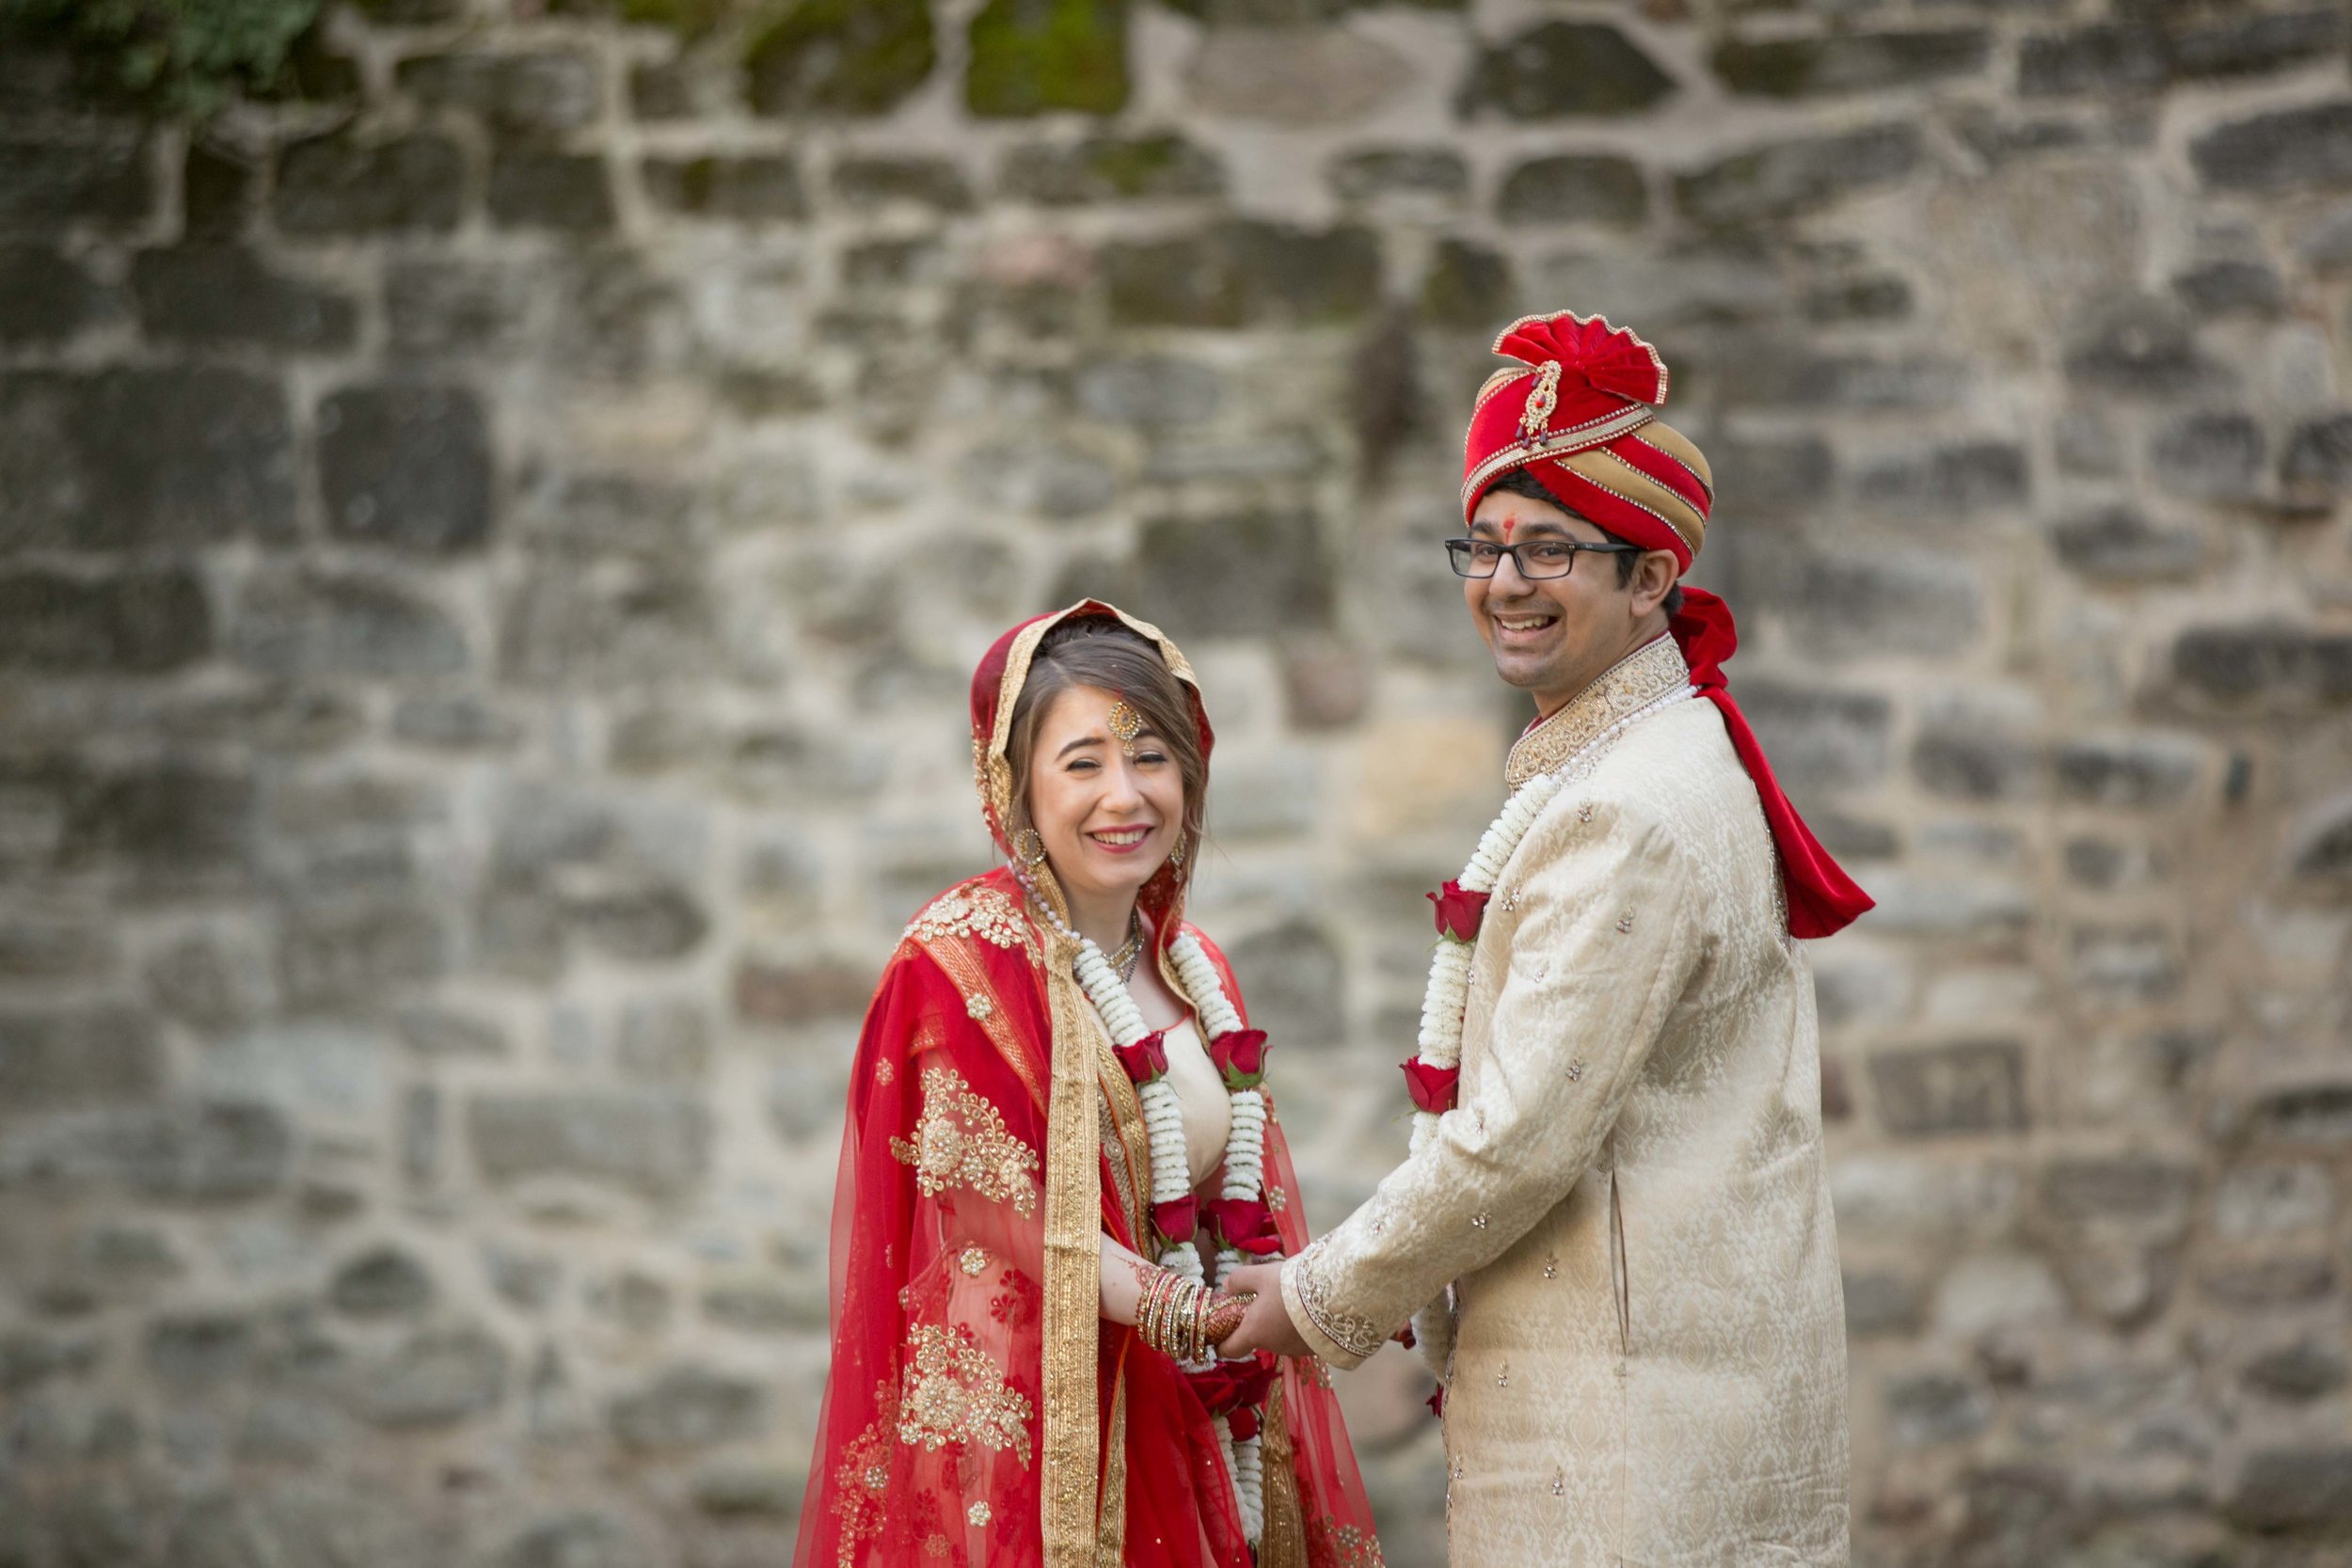 asian-Hindu-wedding-photographer-london-natalia-smith-photography-55.jpg